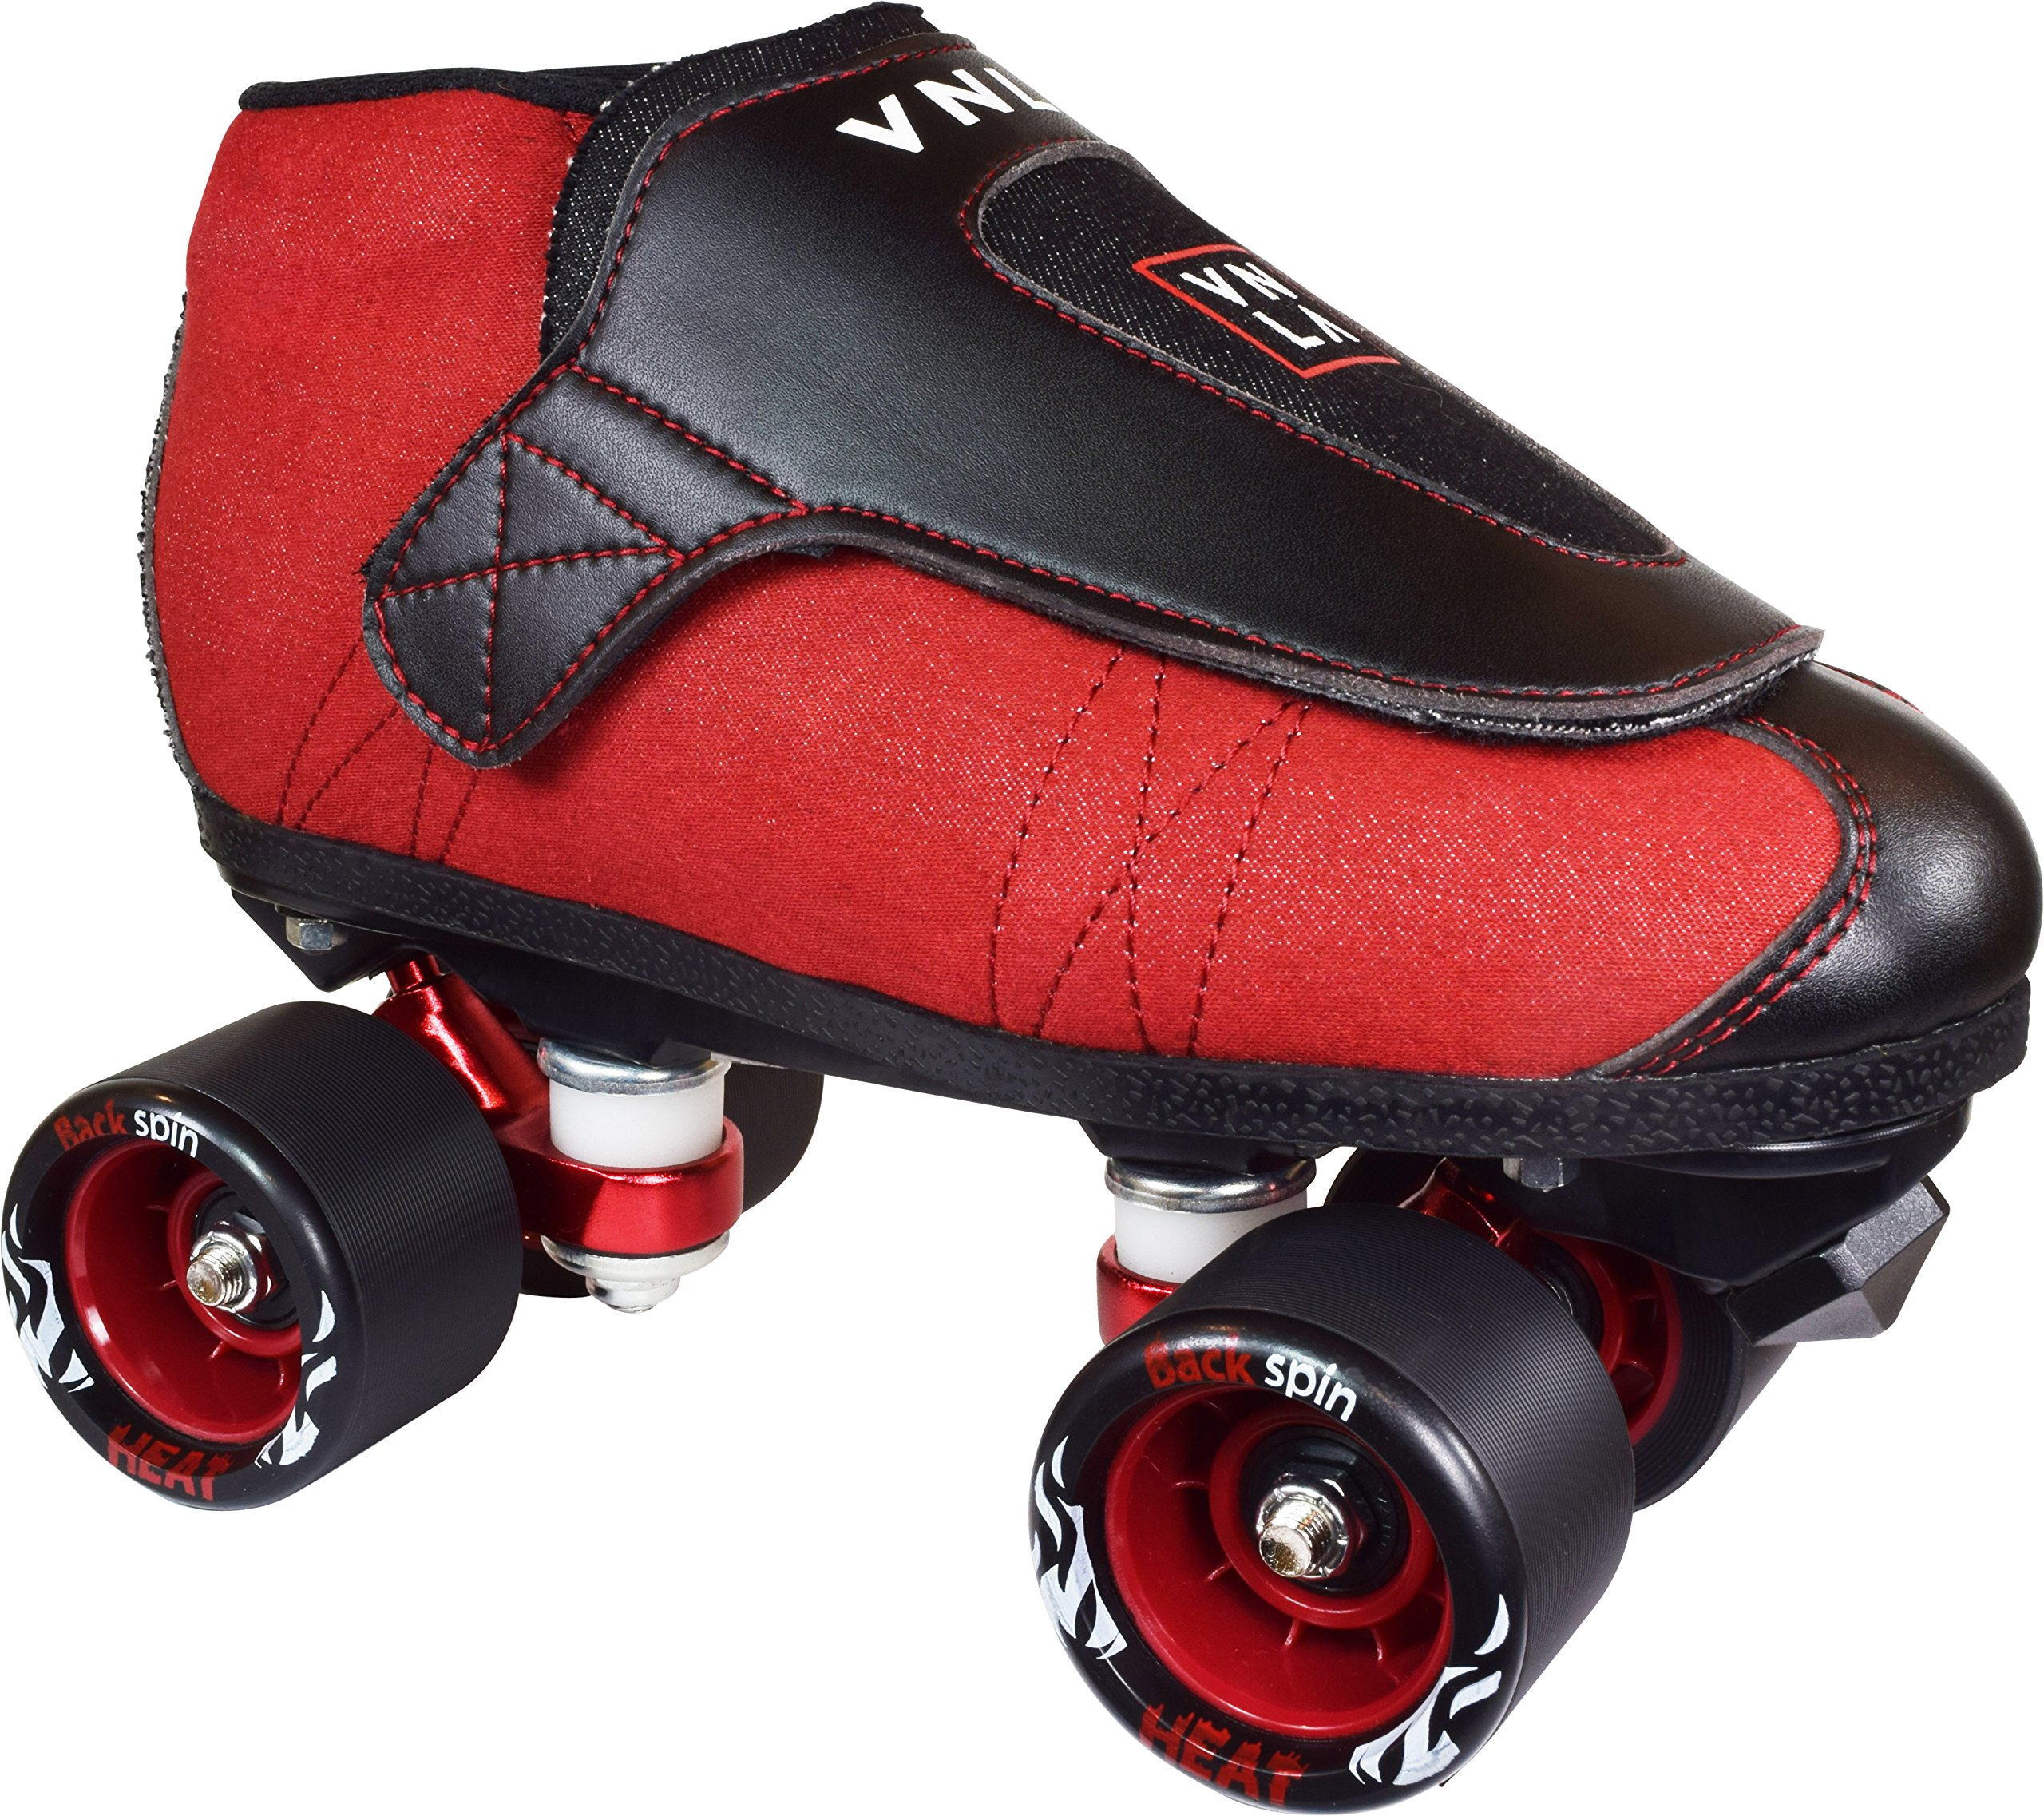 VNLA Code Red Jam Skates | Quad Roller Skates from Vanilla - Indoor speed skates - Denim and Leather - for Tricks and Rhythm skating (Red and Black) Mens 9 / Ladies 10 by VNLA